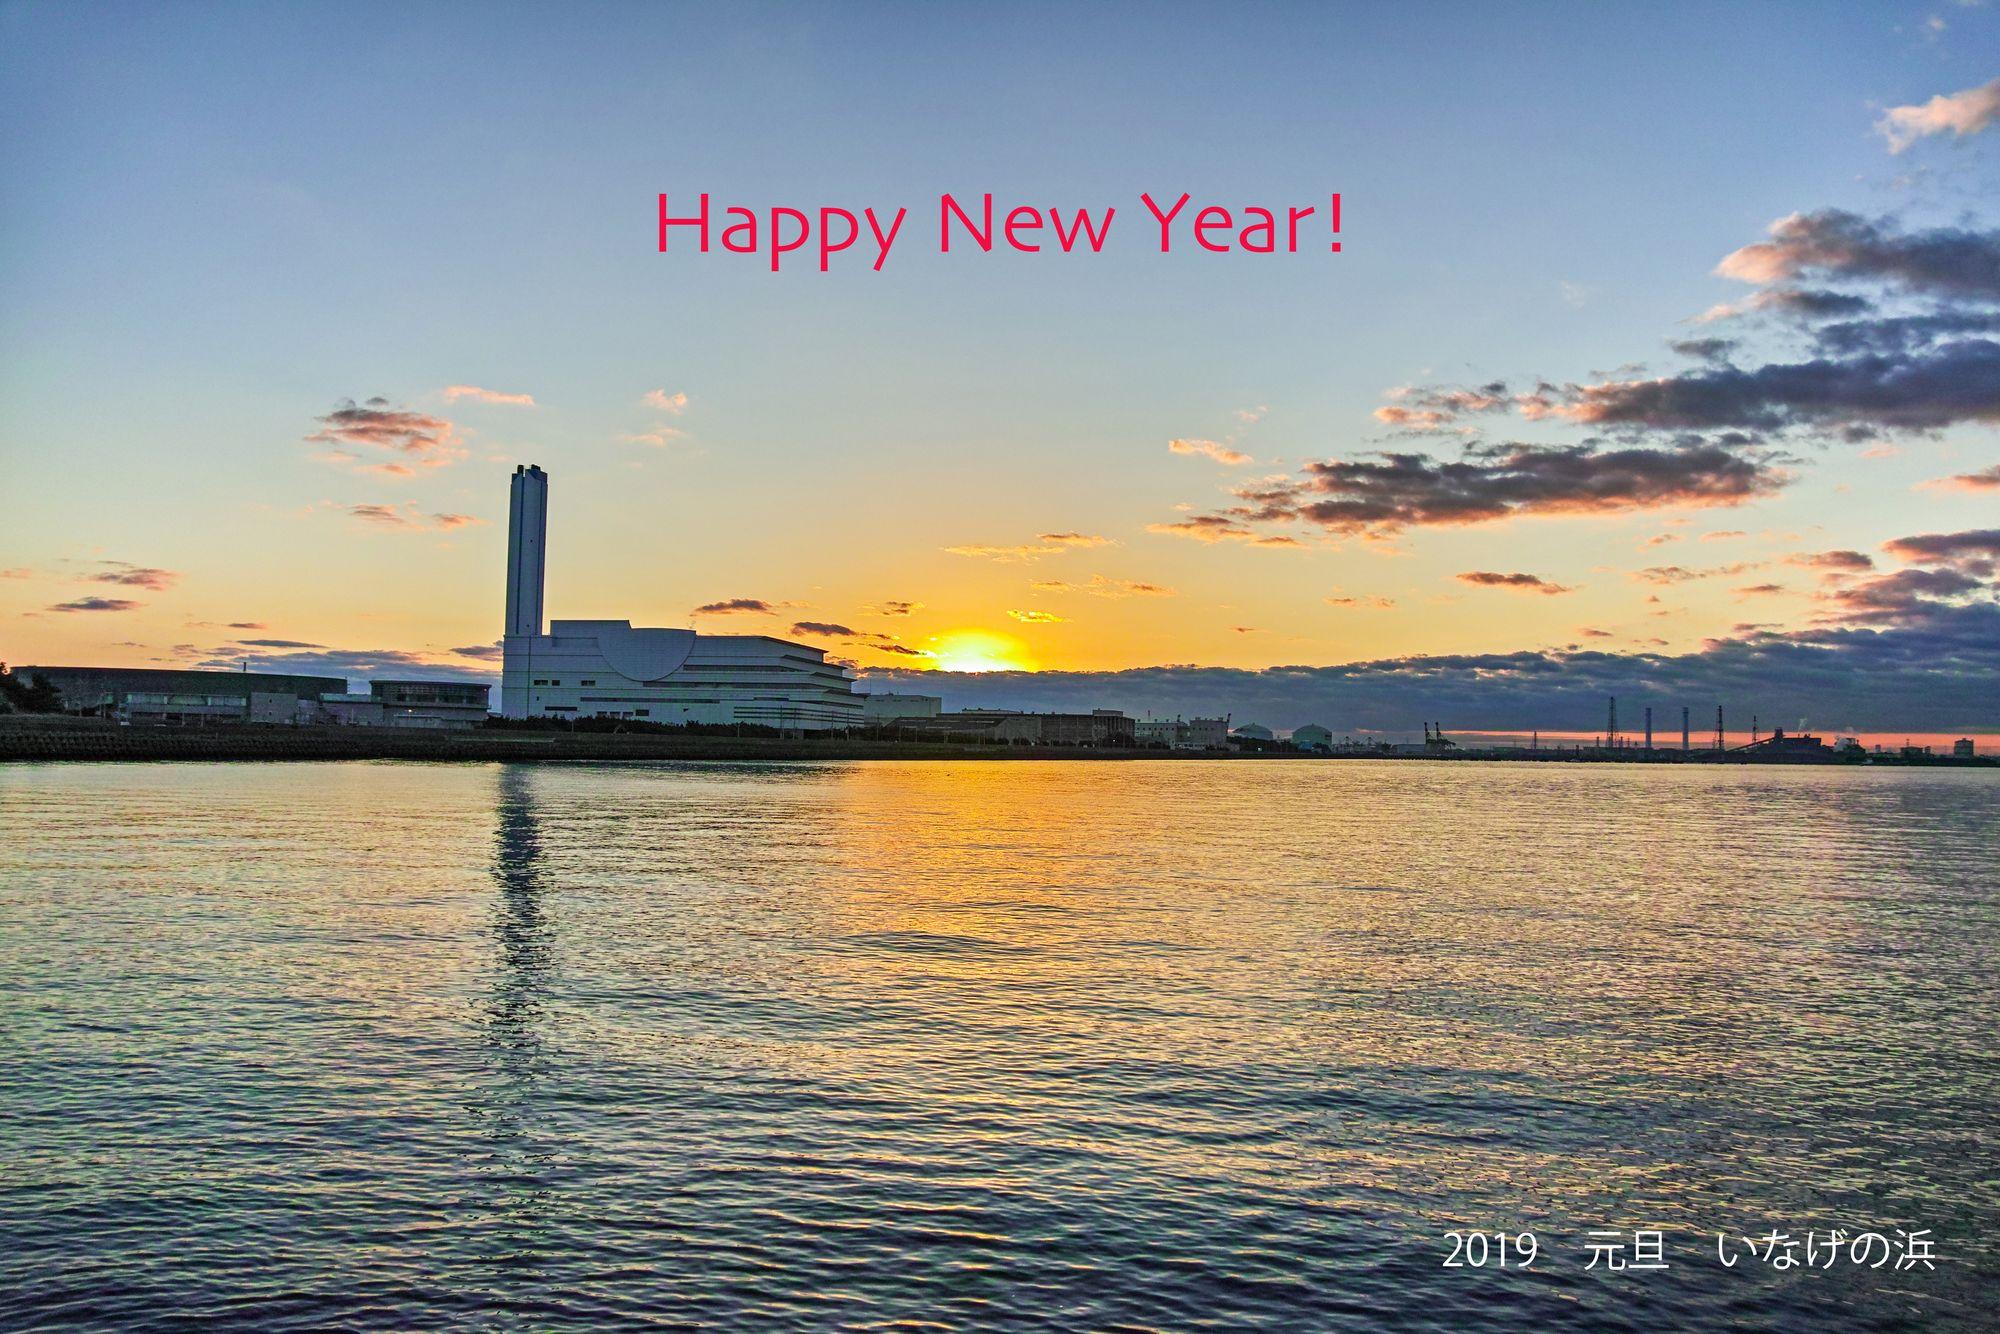 2019 Happy New Year!